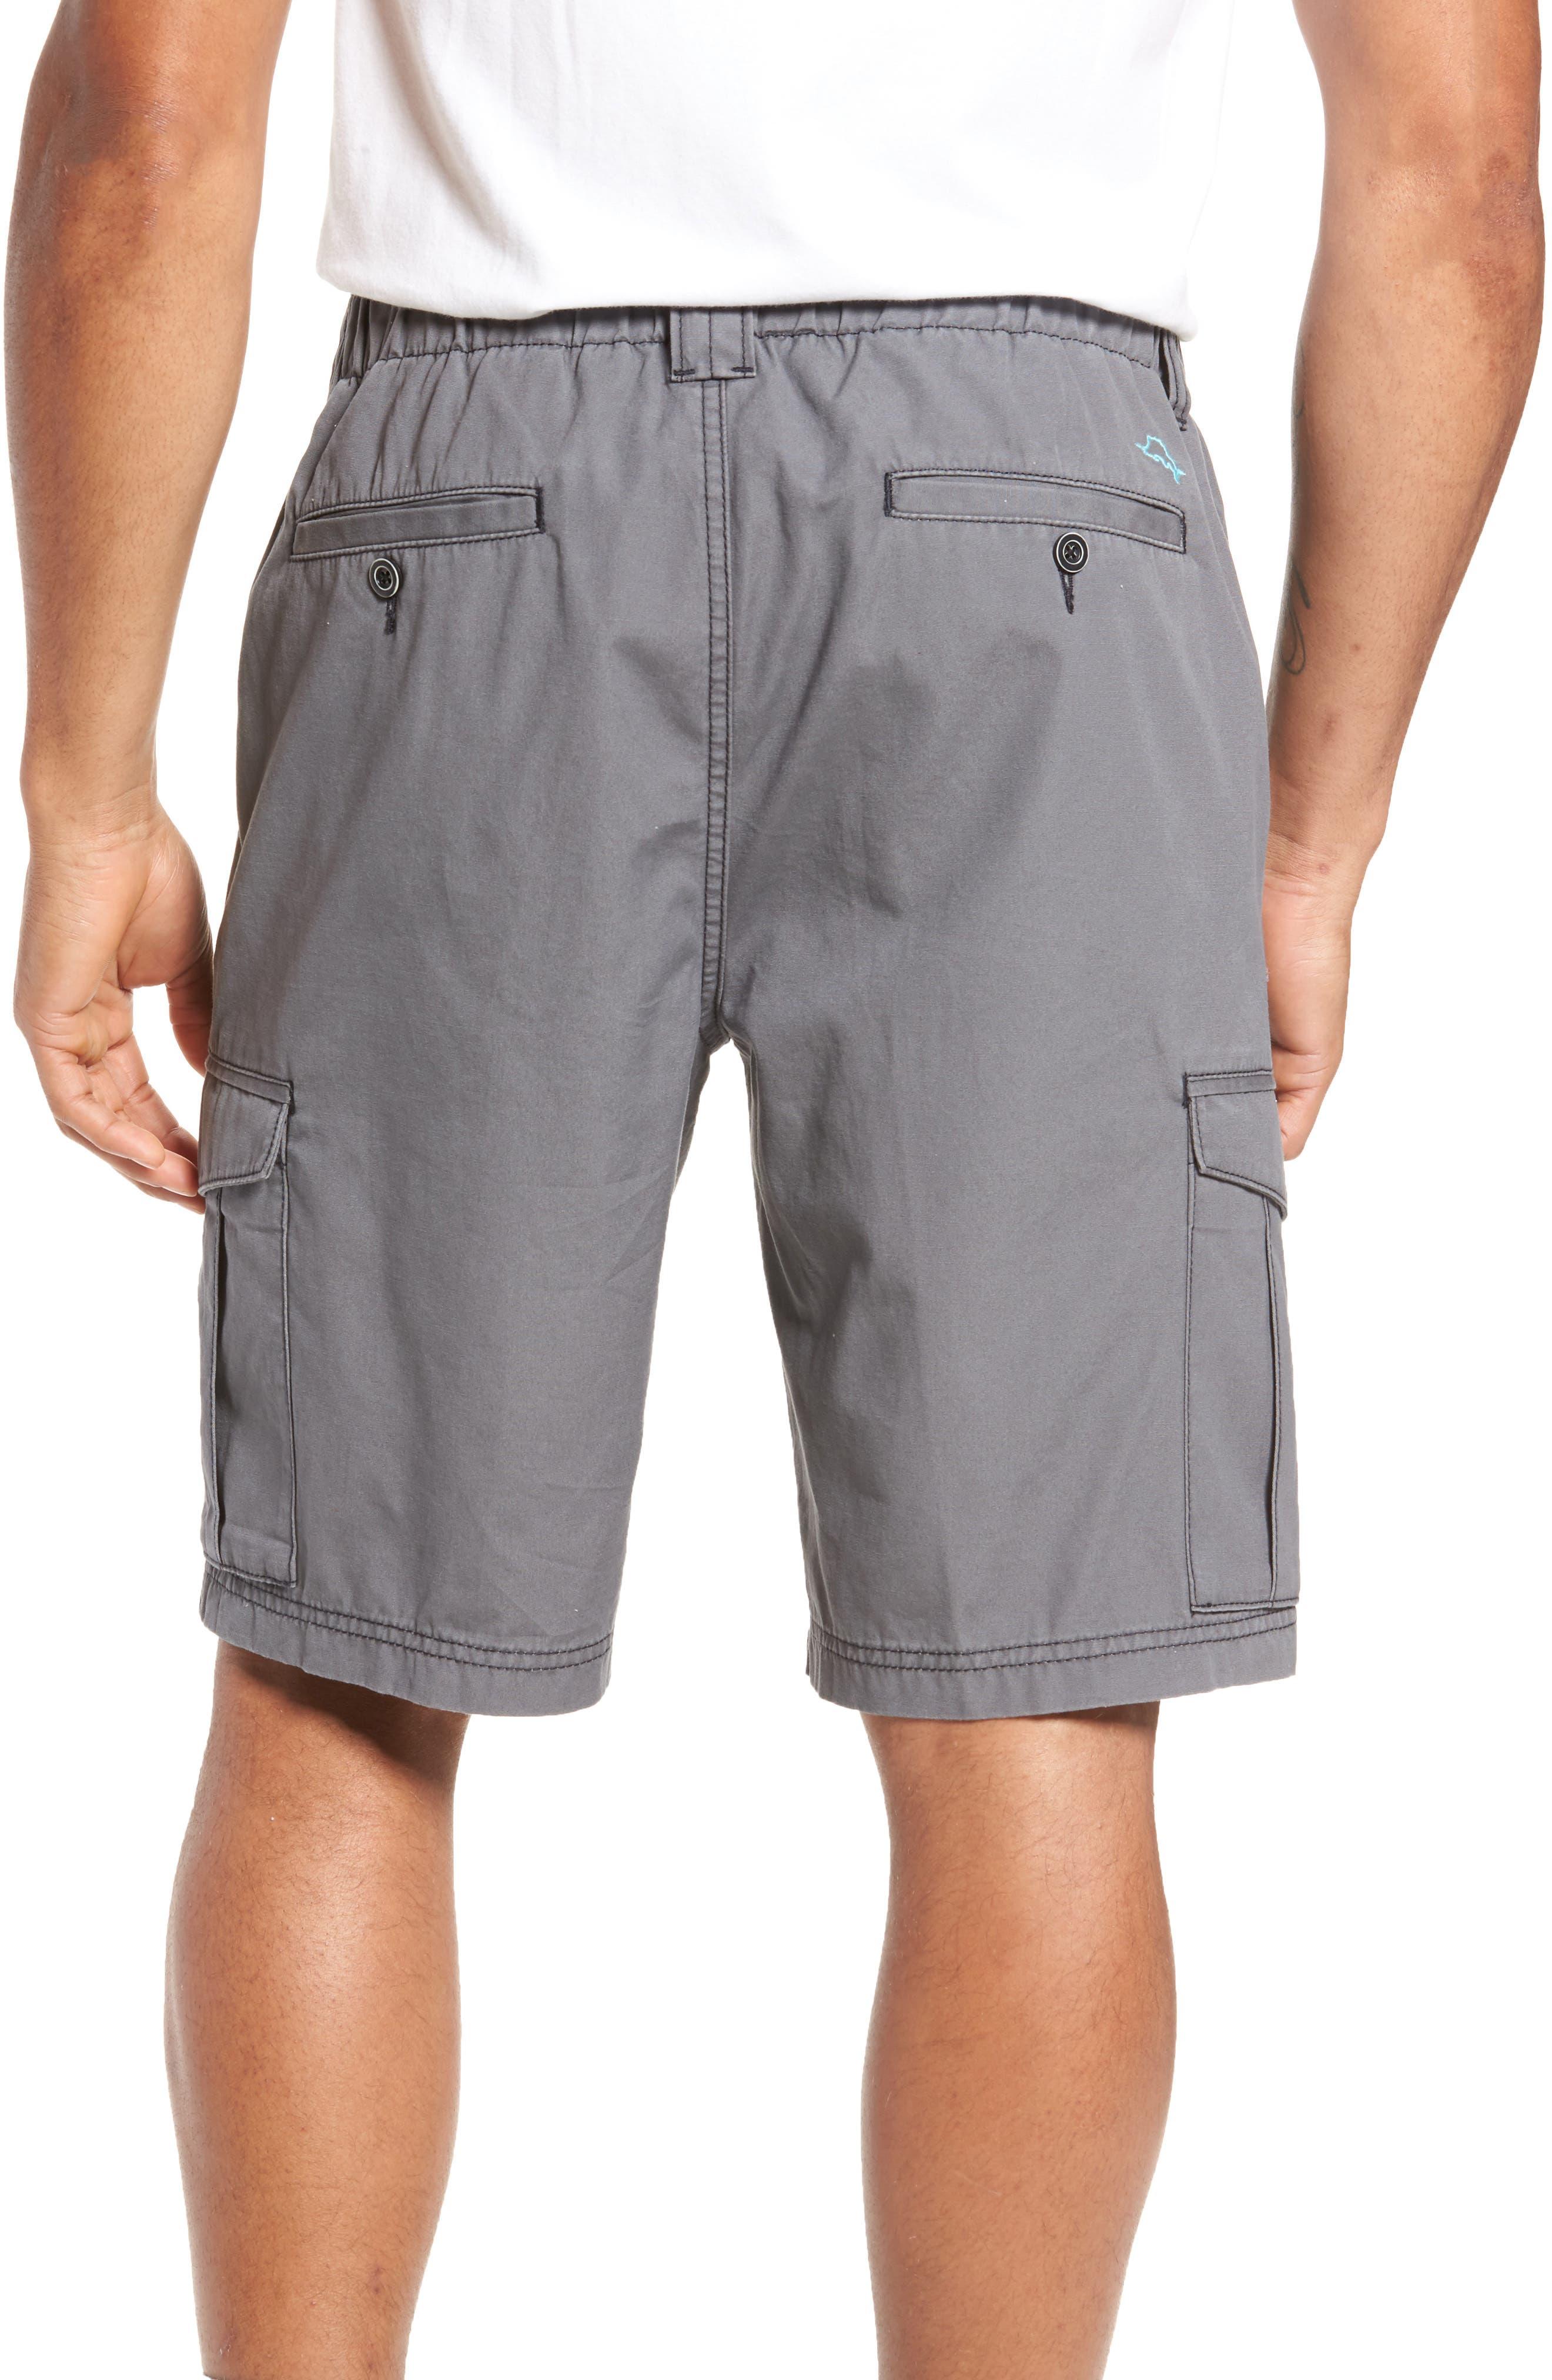 Island Survivalist Cargo Shorts,                             Alternate thumbnail 2, color,                             FOG GREY